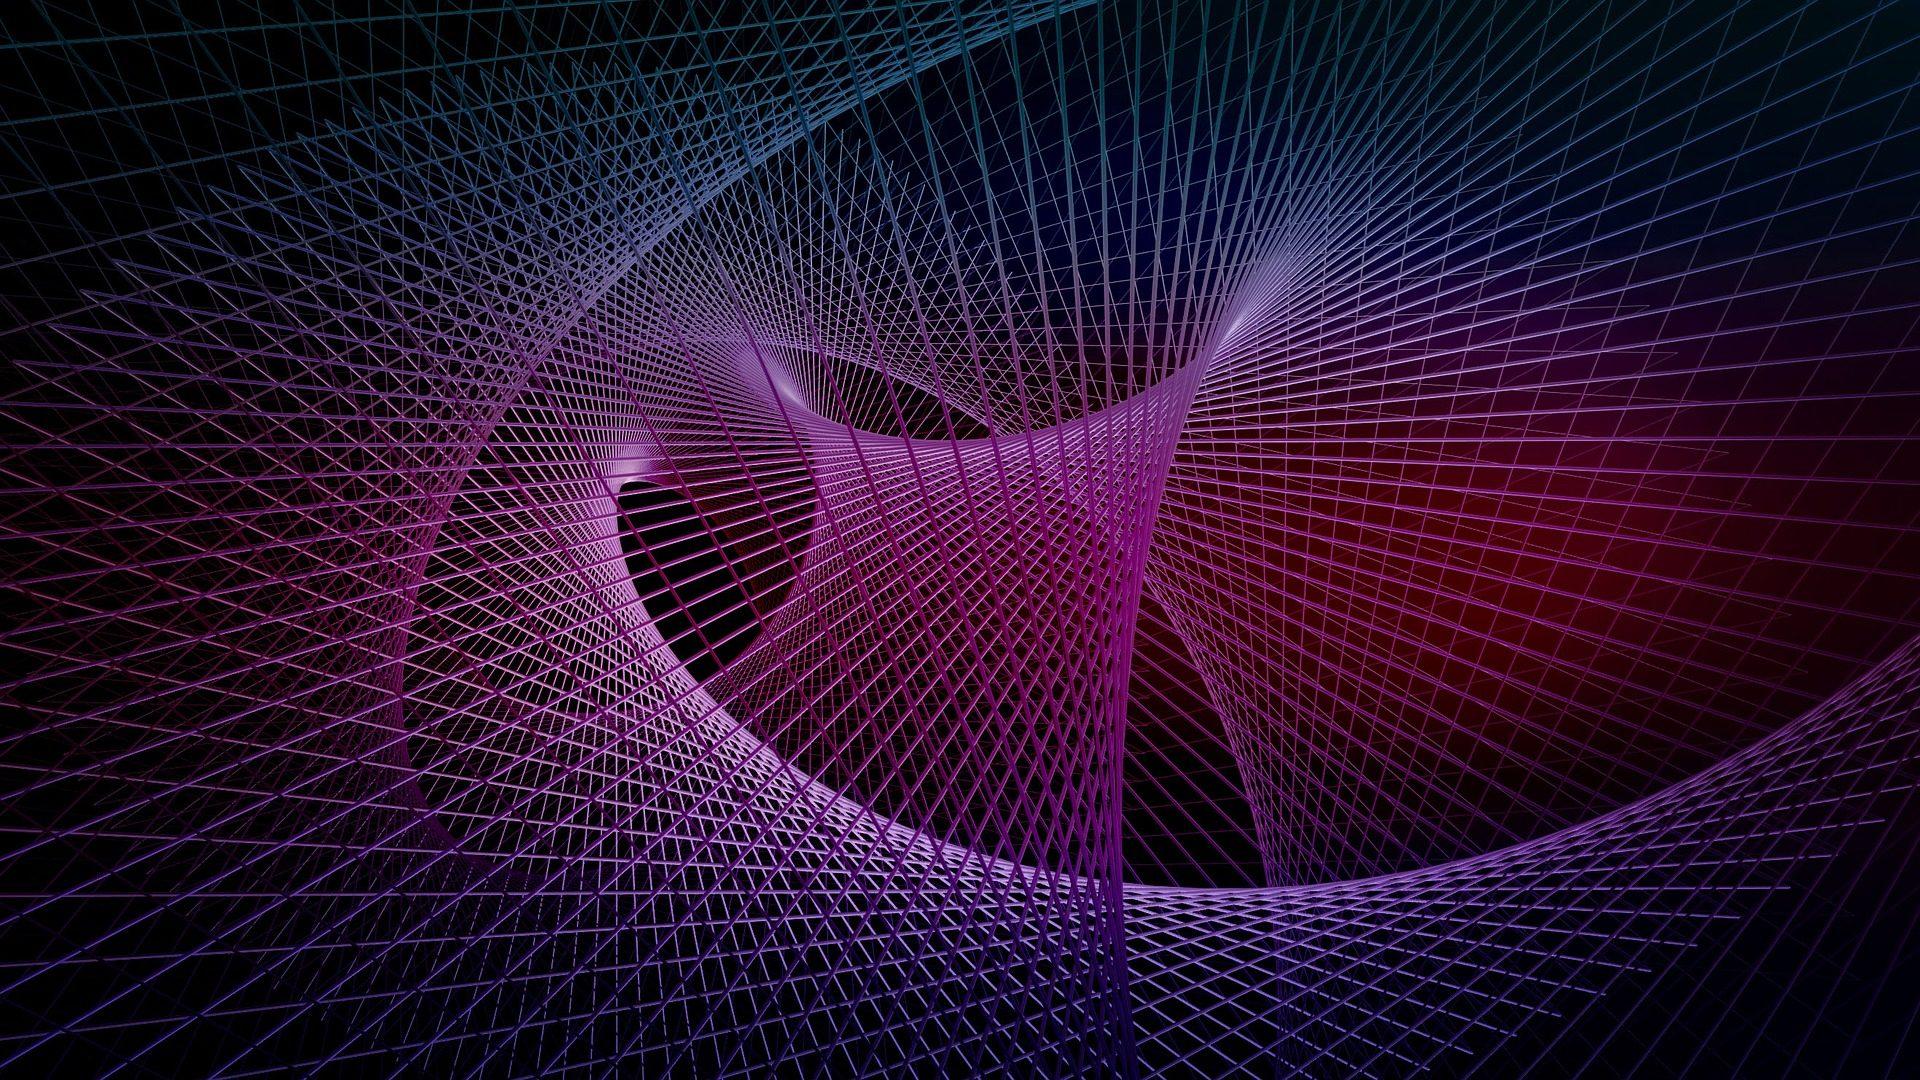 maya, formas, rombos, red, fractal, geometría - Fondos de Pantalla HD - professor-falken.com